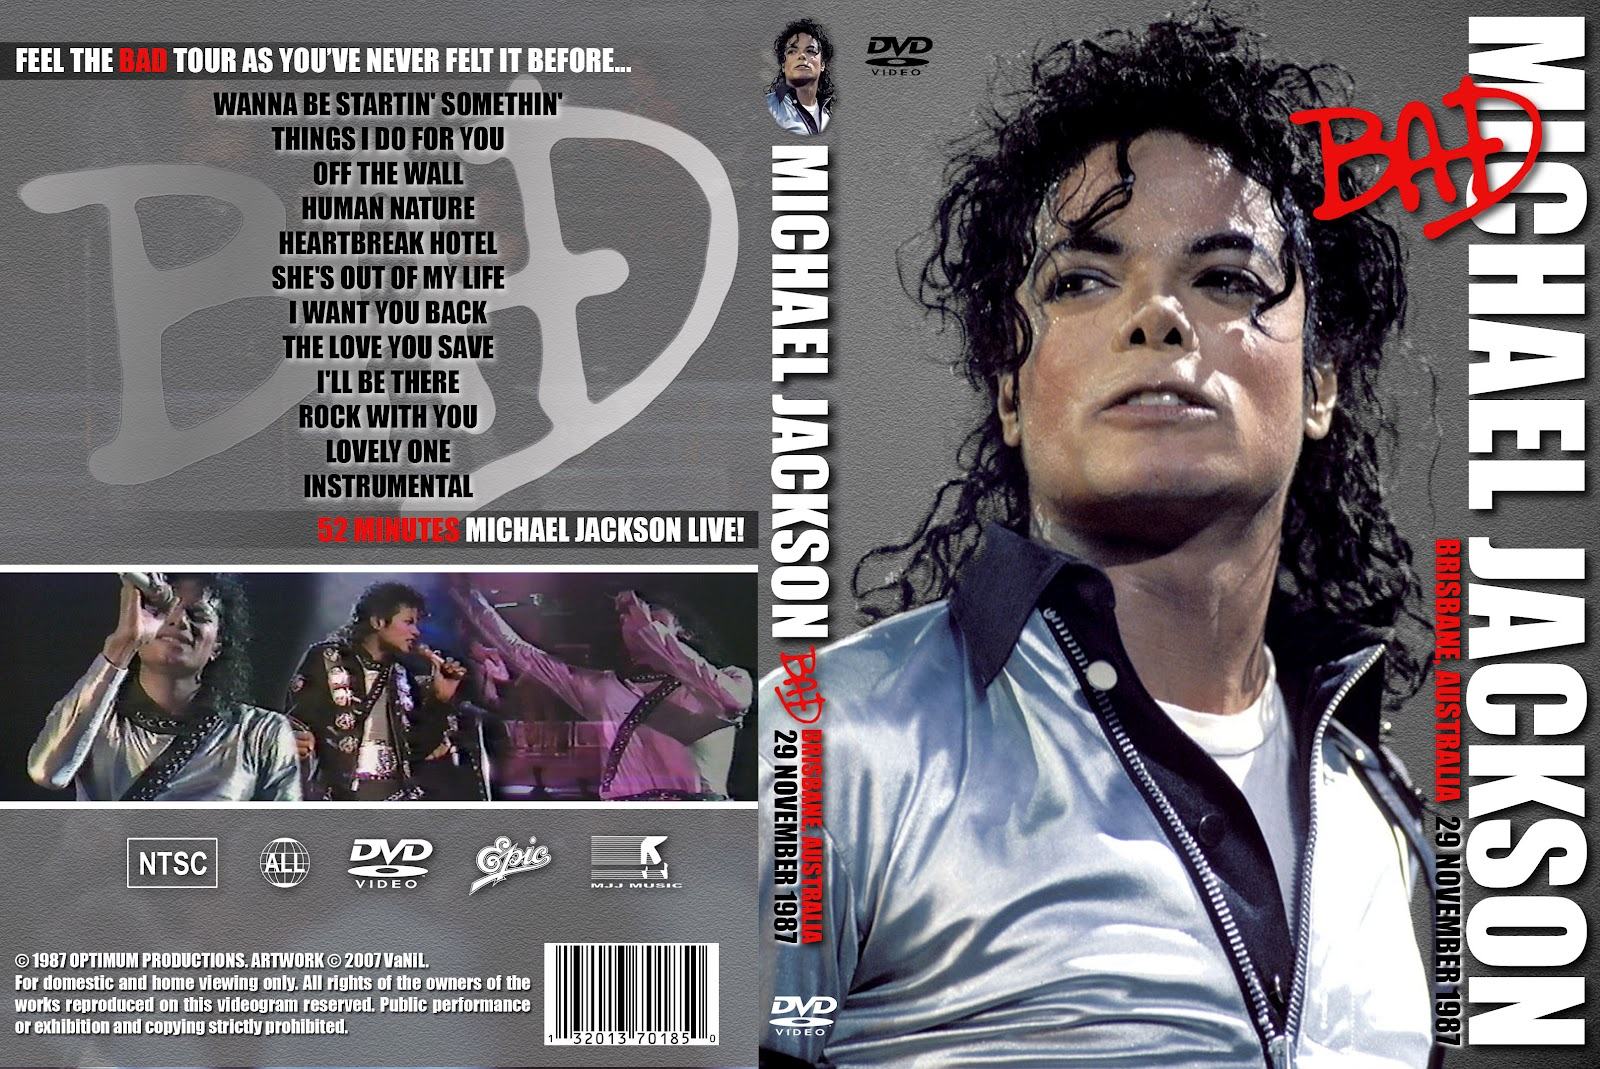 http://1.bp.blogspot.com/--XAPfEtdXm4/UG79EdPDiKI/AAAAAAAAASU/qtv6dHgZiNA/s1600/Michael+Jackson+-+Live+in+Bad+Tour+(Brisbane-Australia+1987)%5BDVD%5D%5BMJLand_ro%5D+-+DVD+COVER.jpg